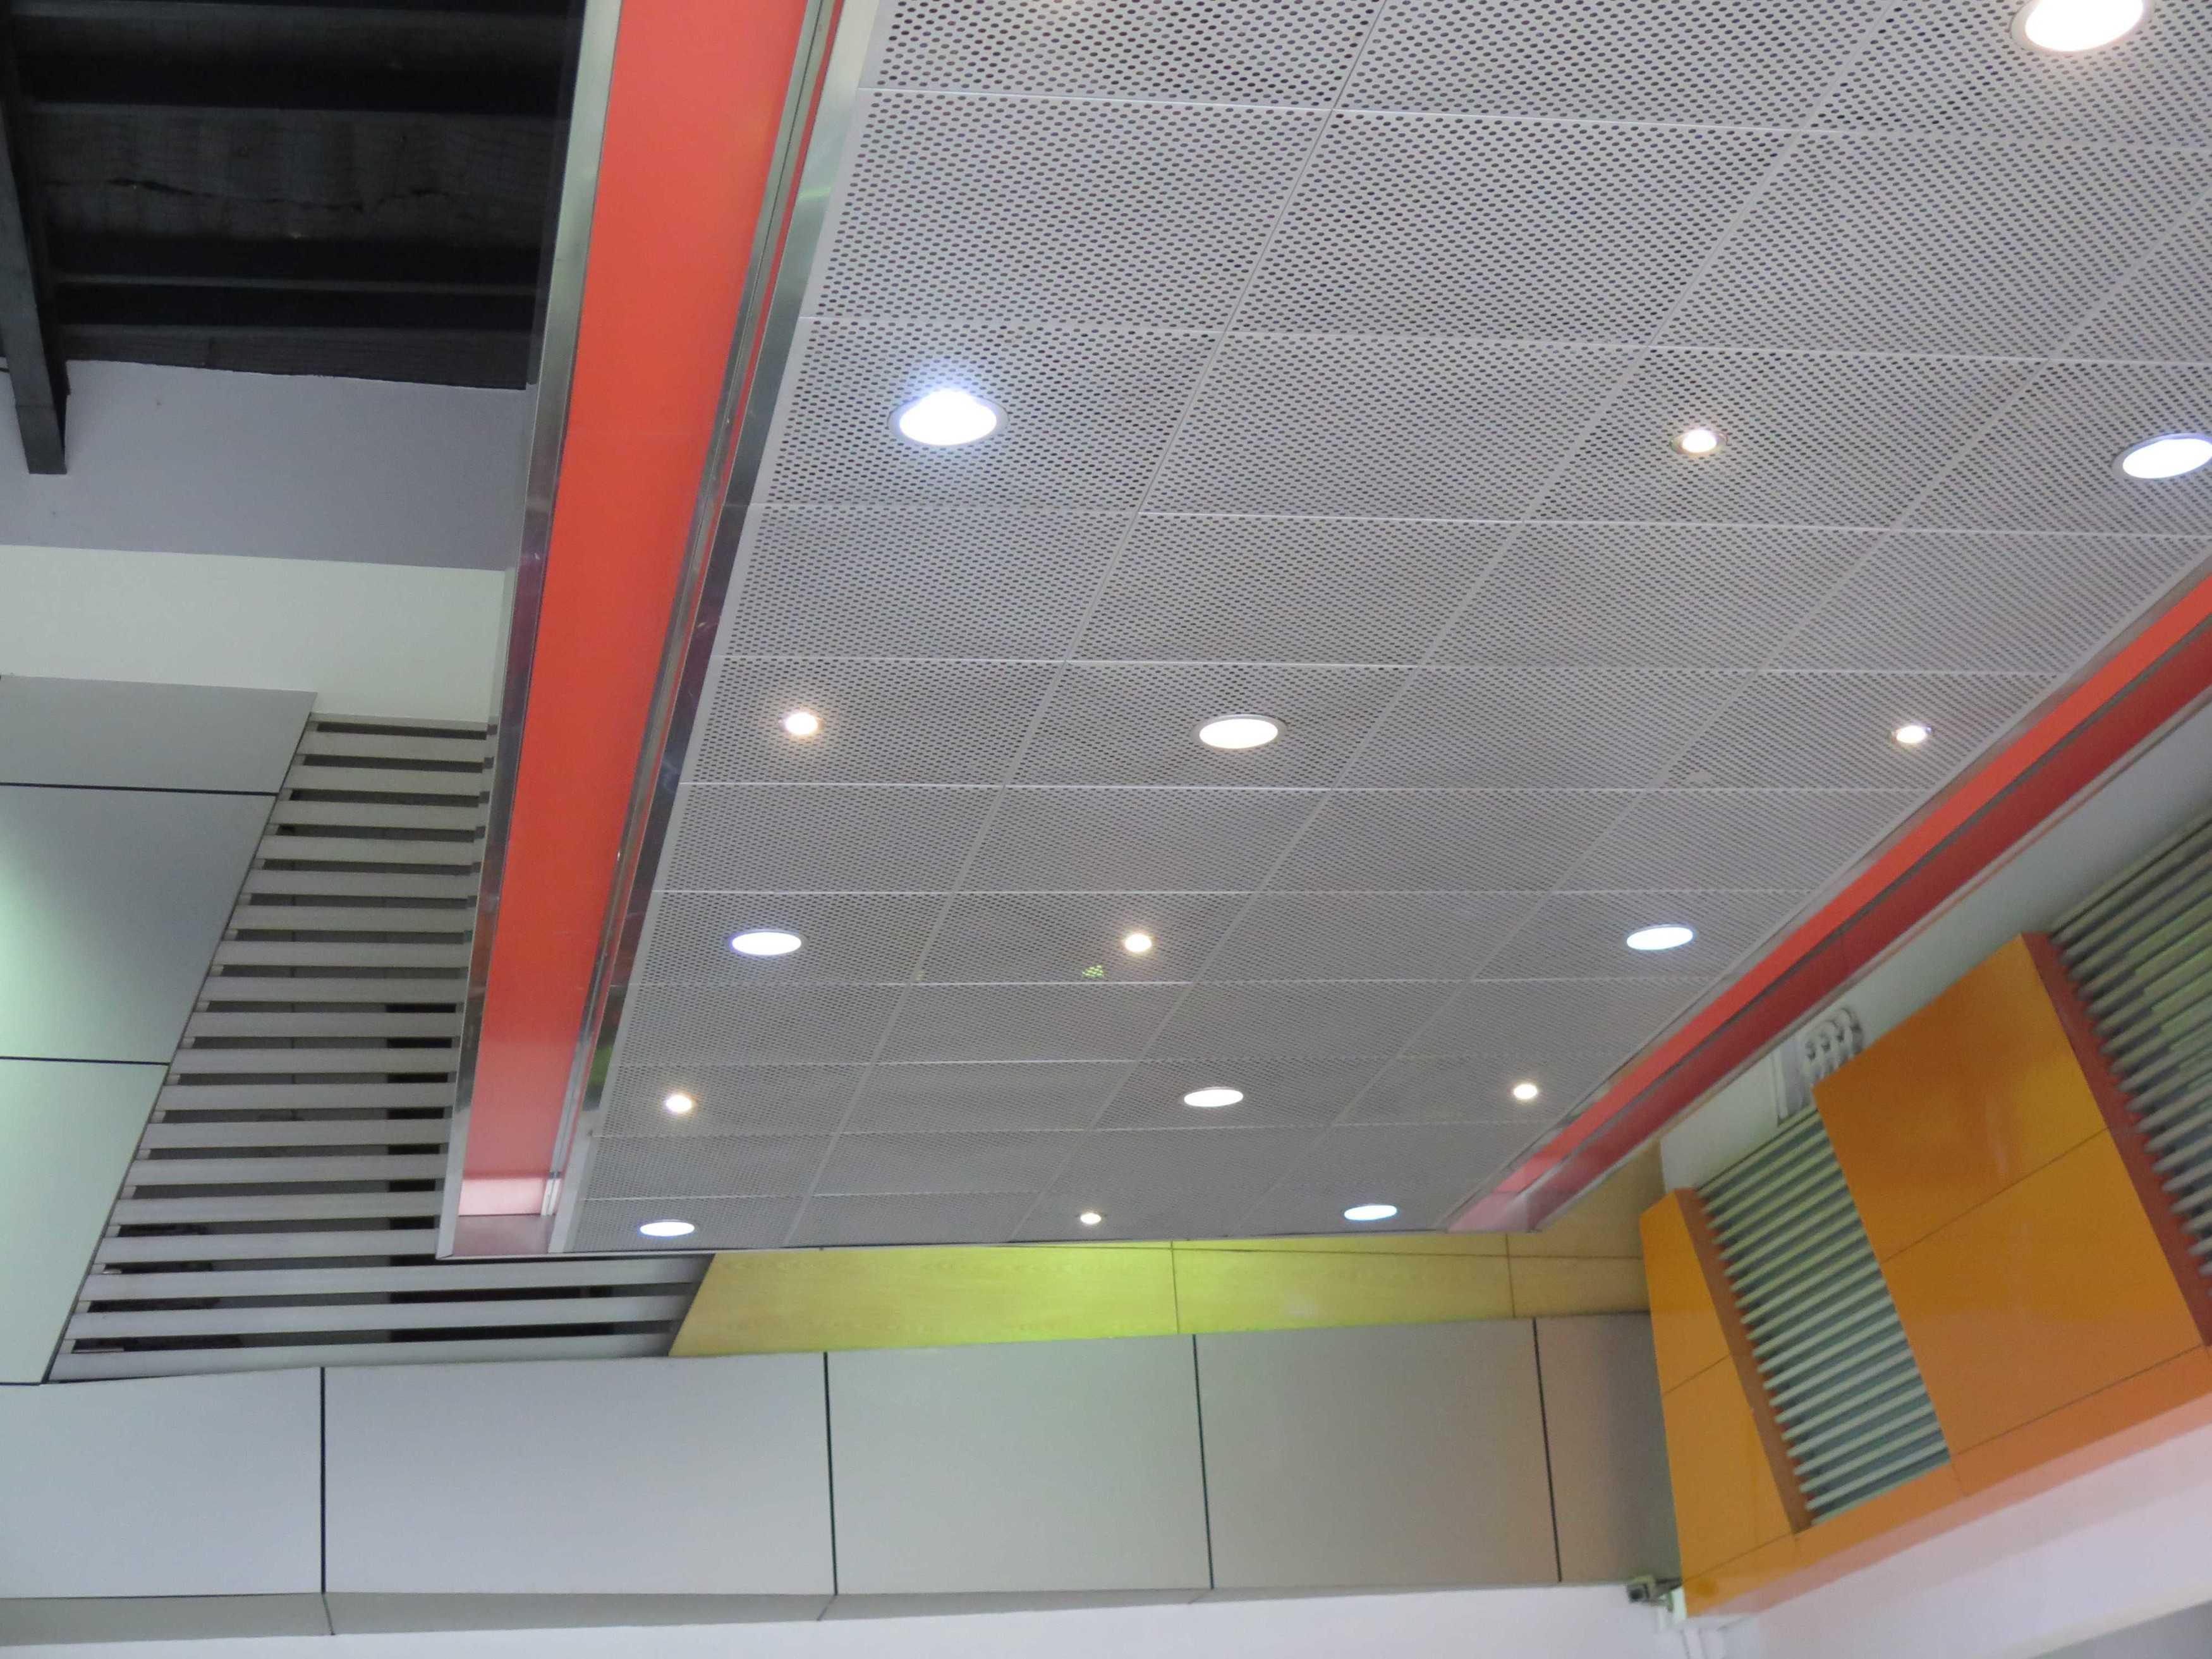 Christianto Hendrawan Omega Motor-Showroom Design Bandung Bandung Perforated Ceiling   30906